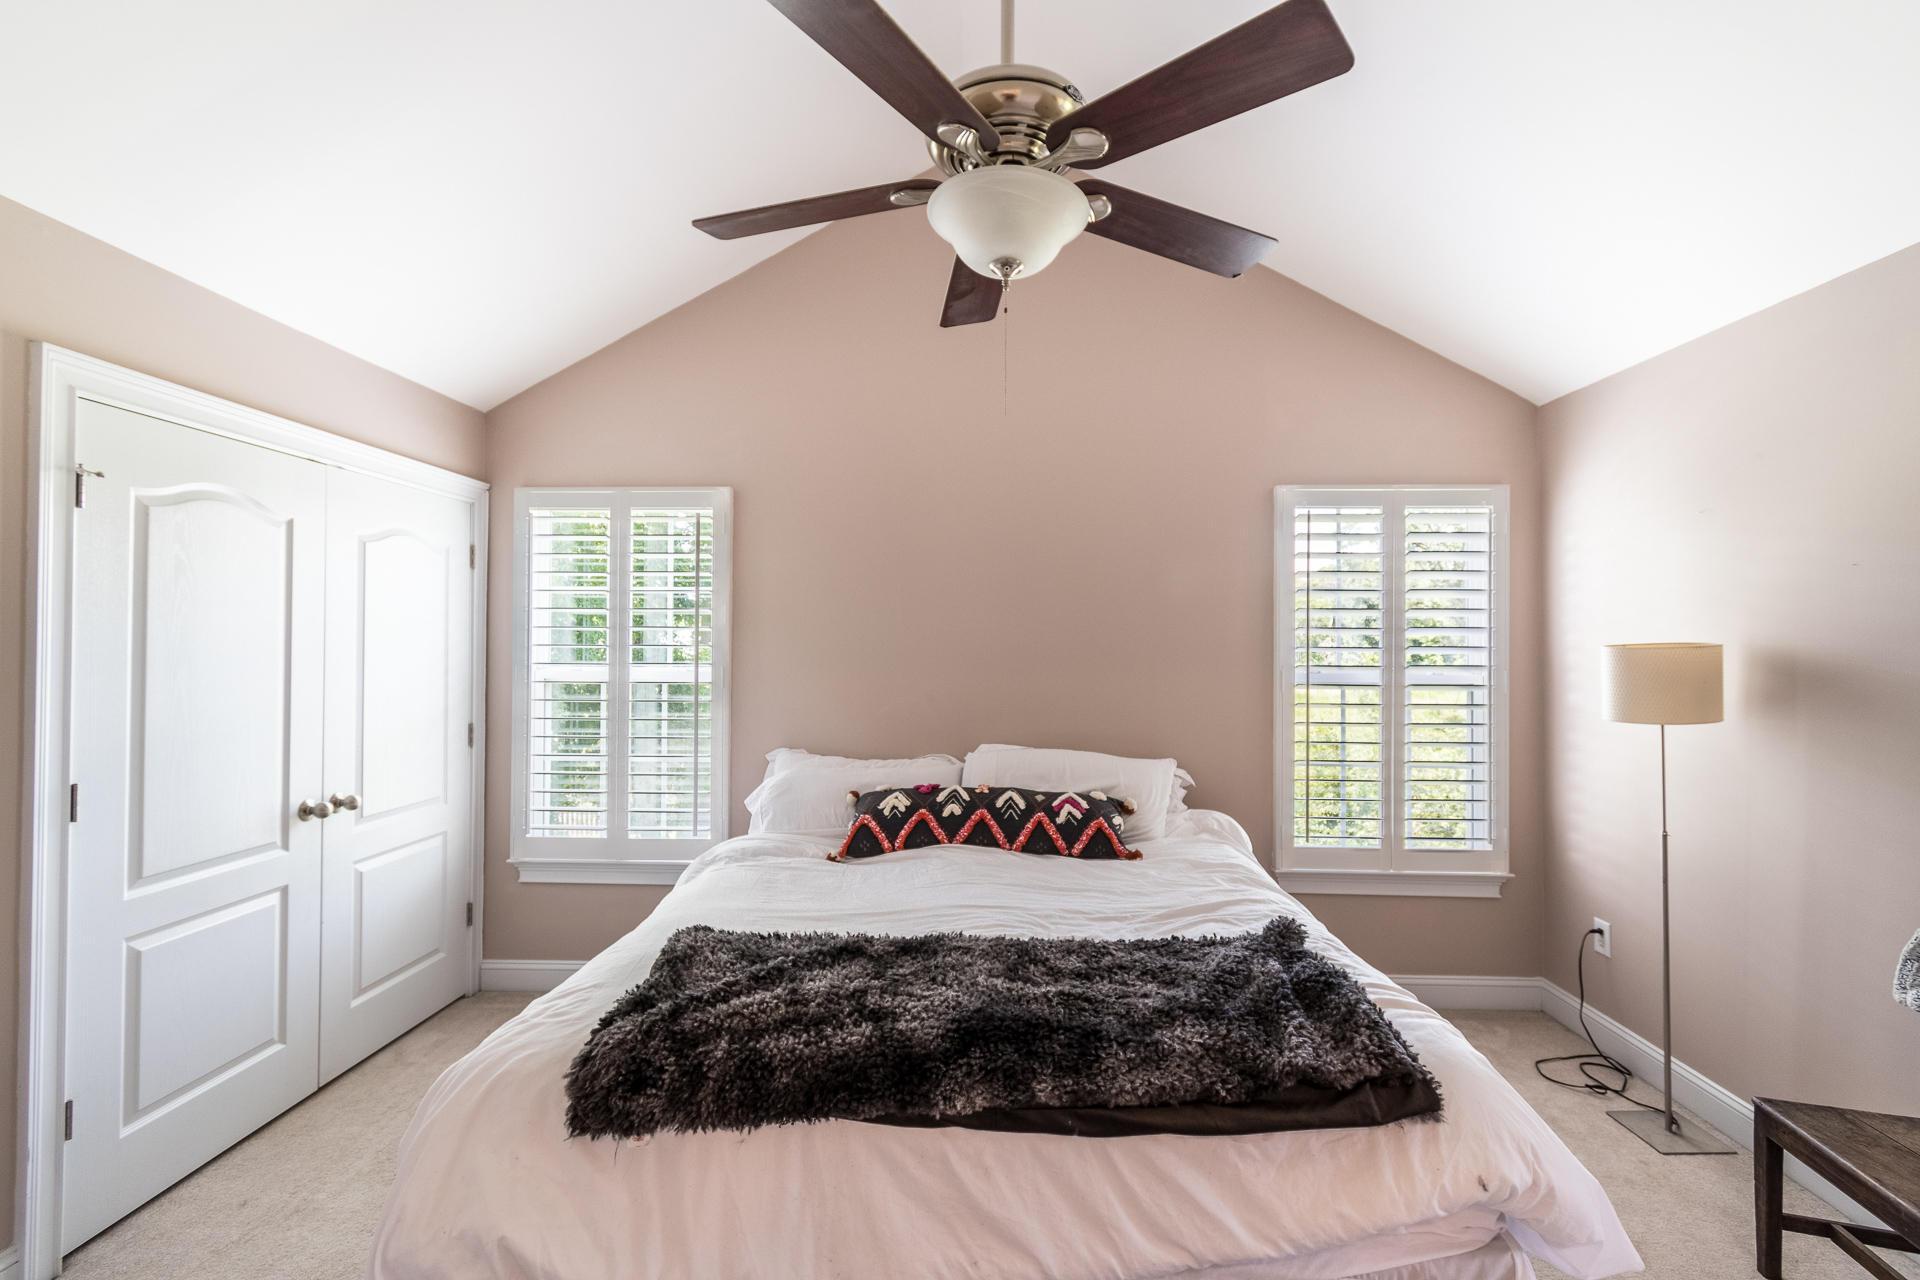 Stoneboro Shores Homes For Sale - 656 Stoneboro, Charleston, SC - 2